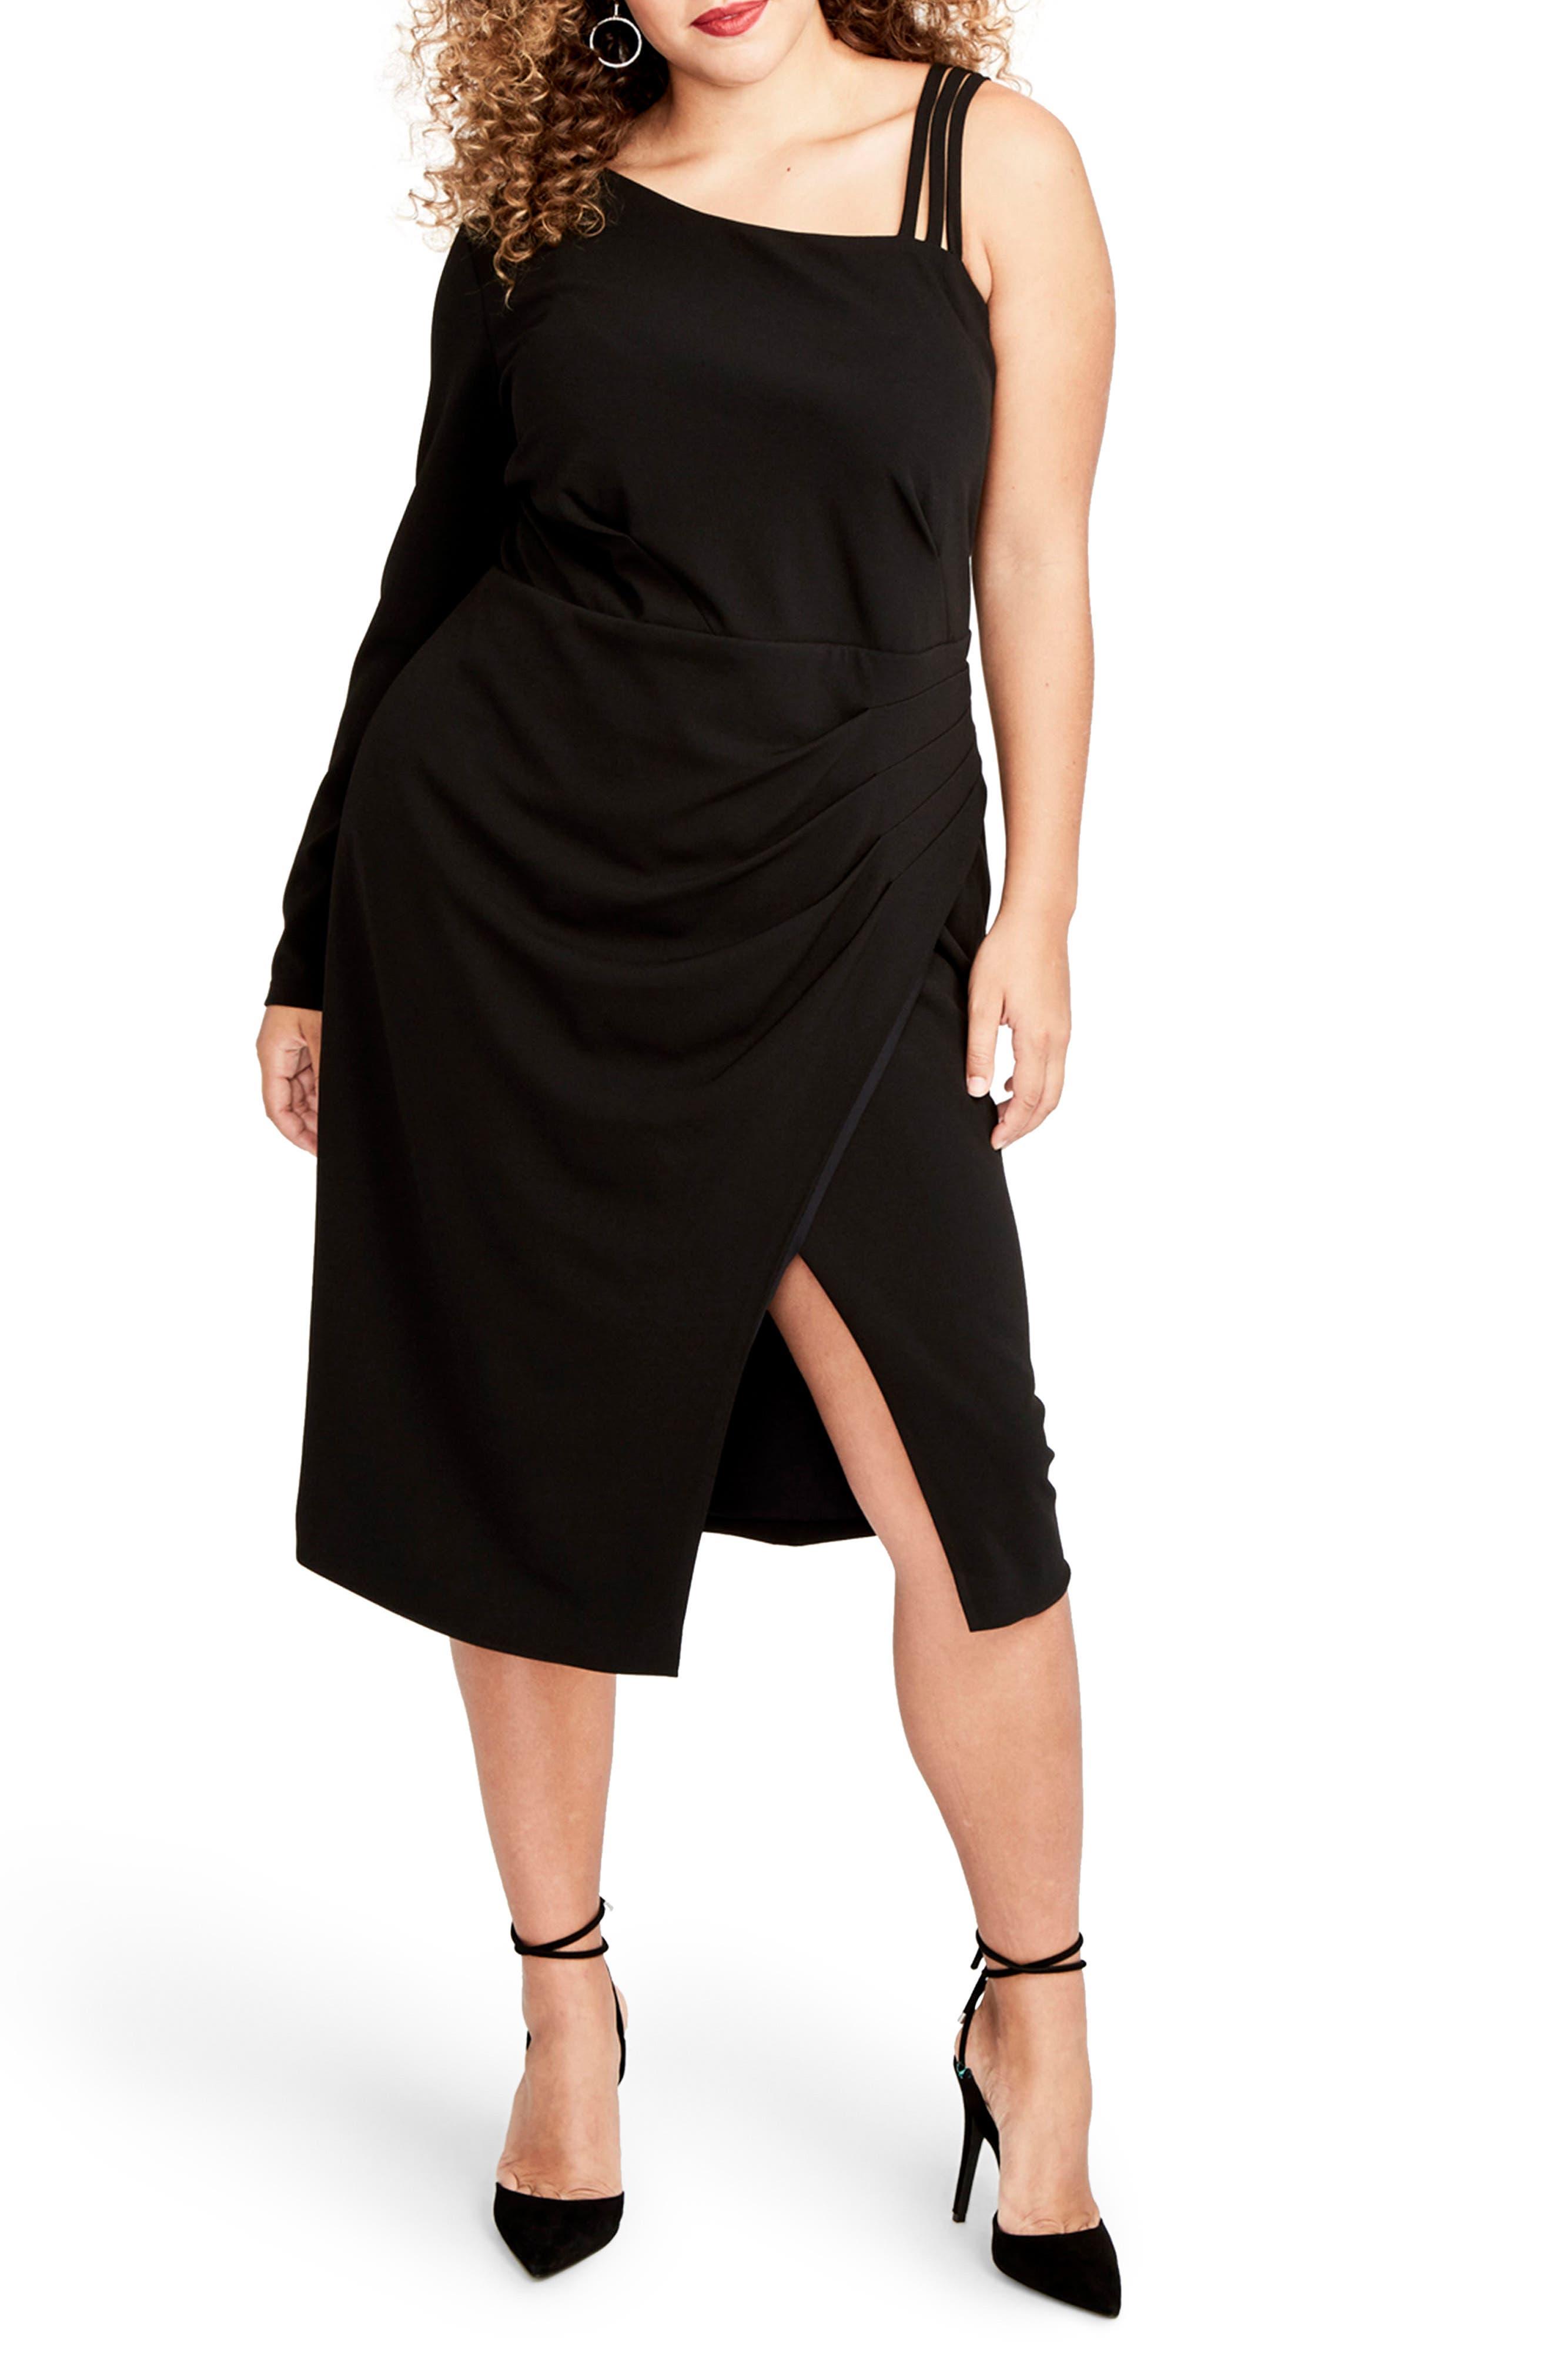 Alternate Image 1 Selected - RACHEL Rachel Roy Asymmetrical Faux Wrap Dress (Plus Size)